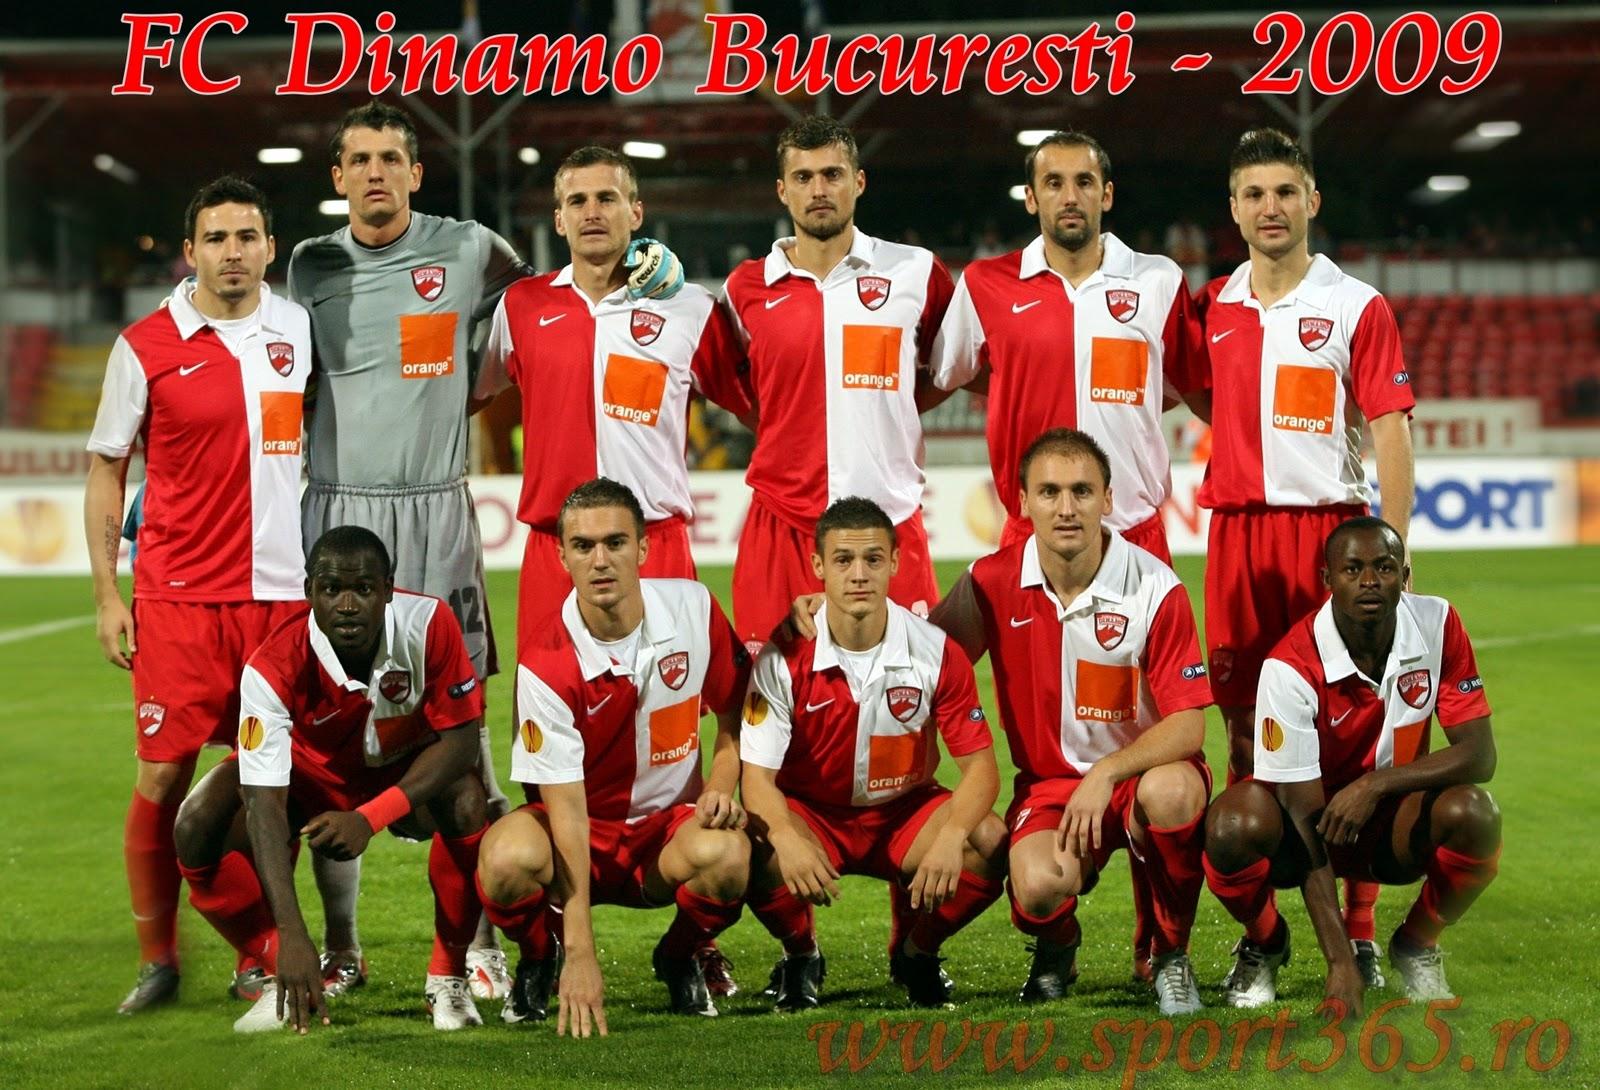 Liga da romenia